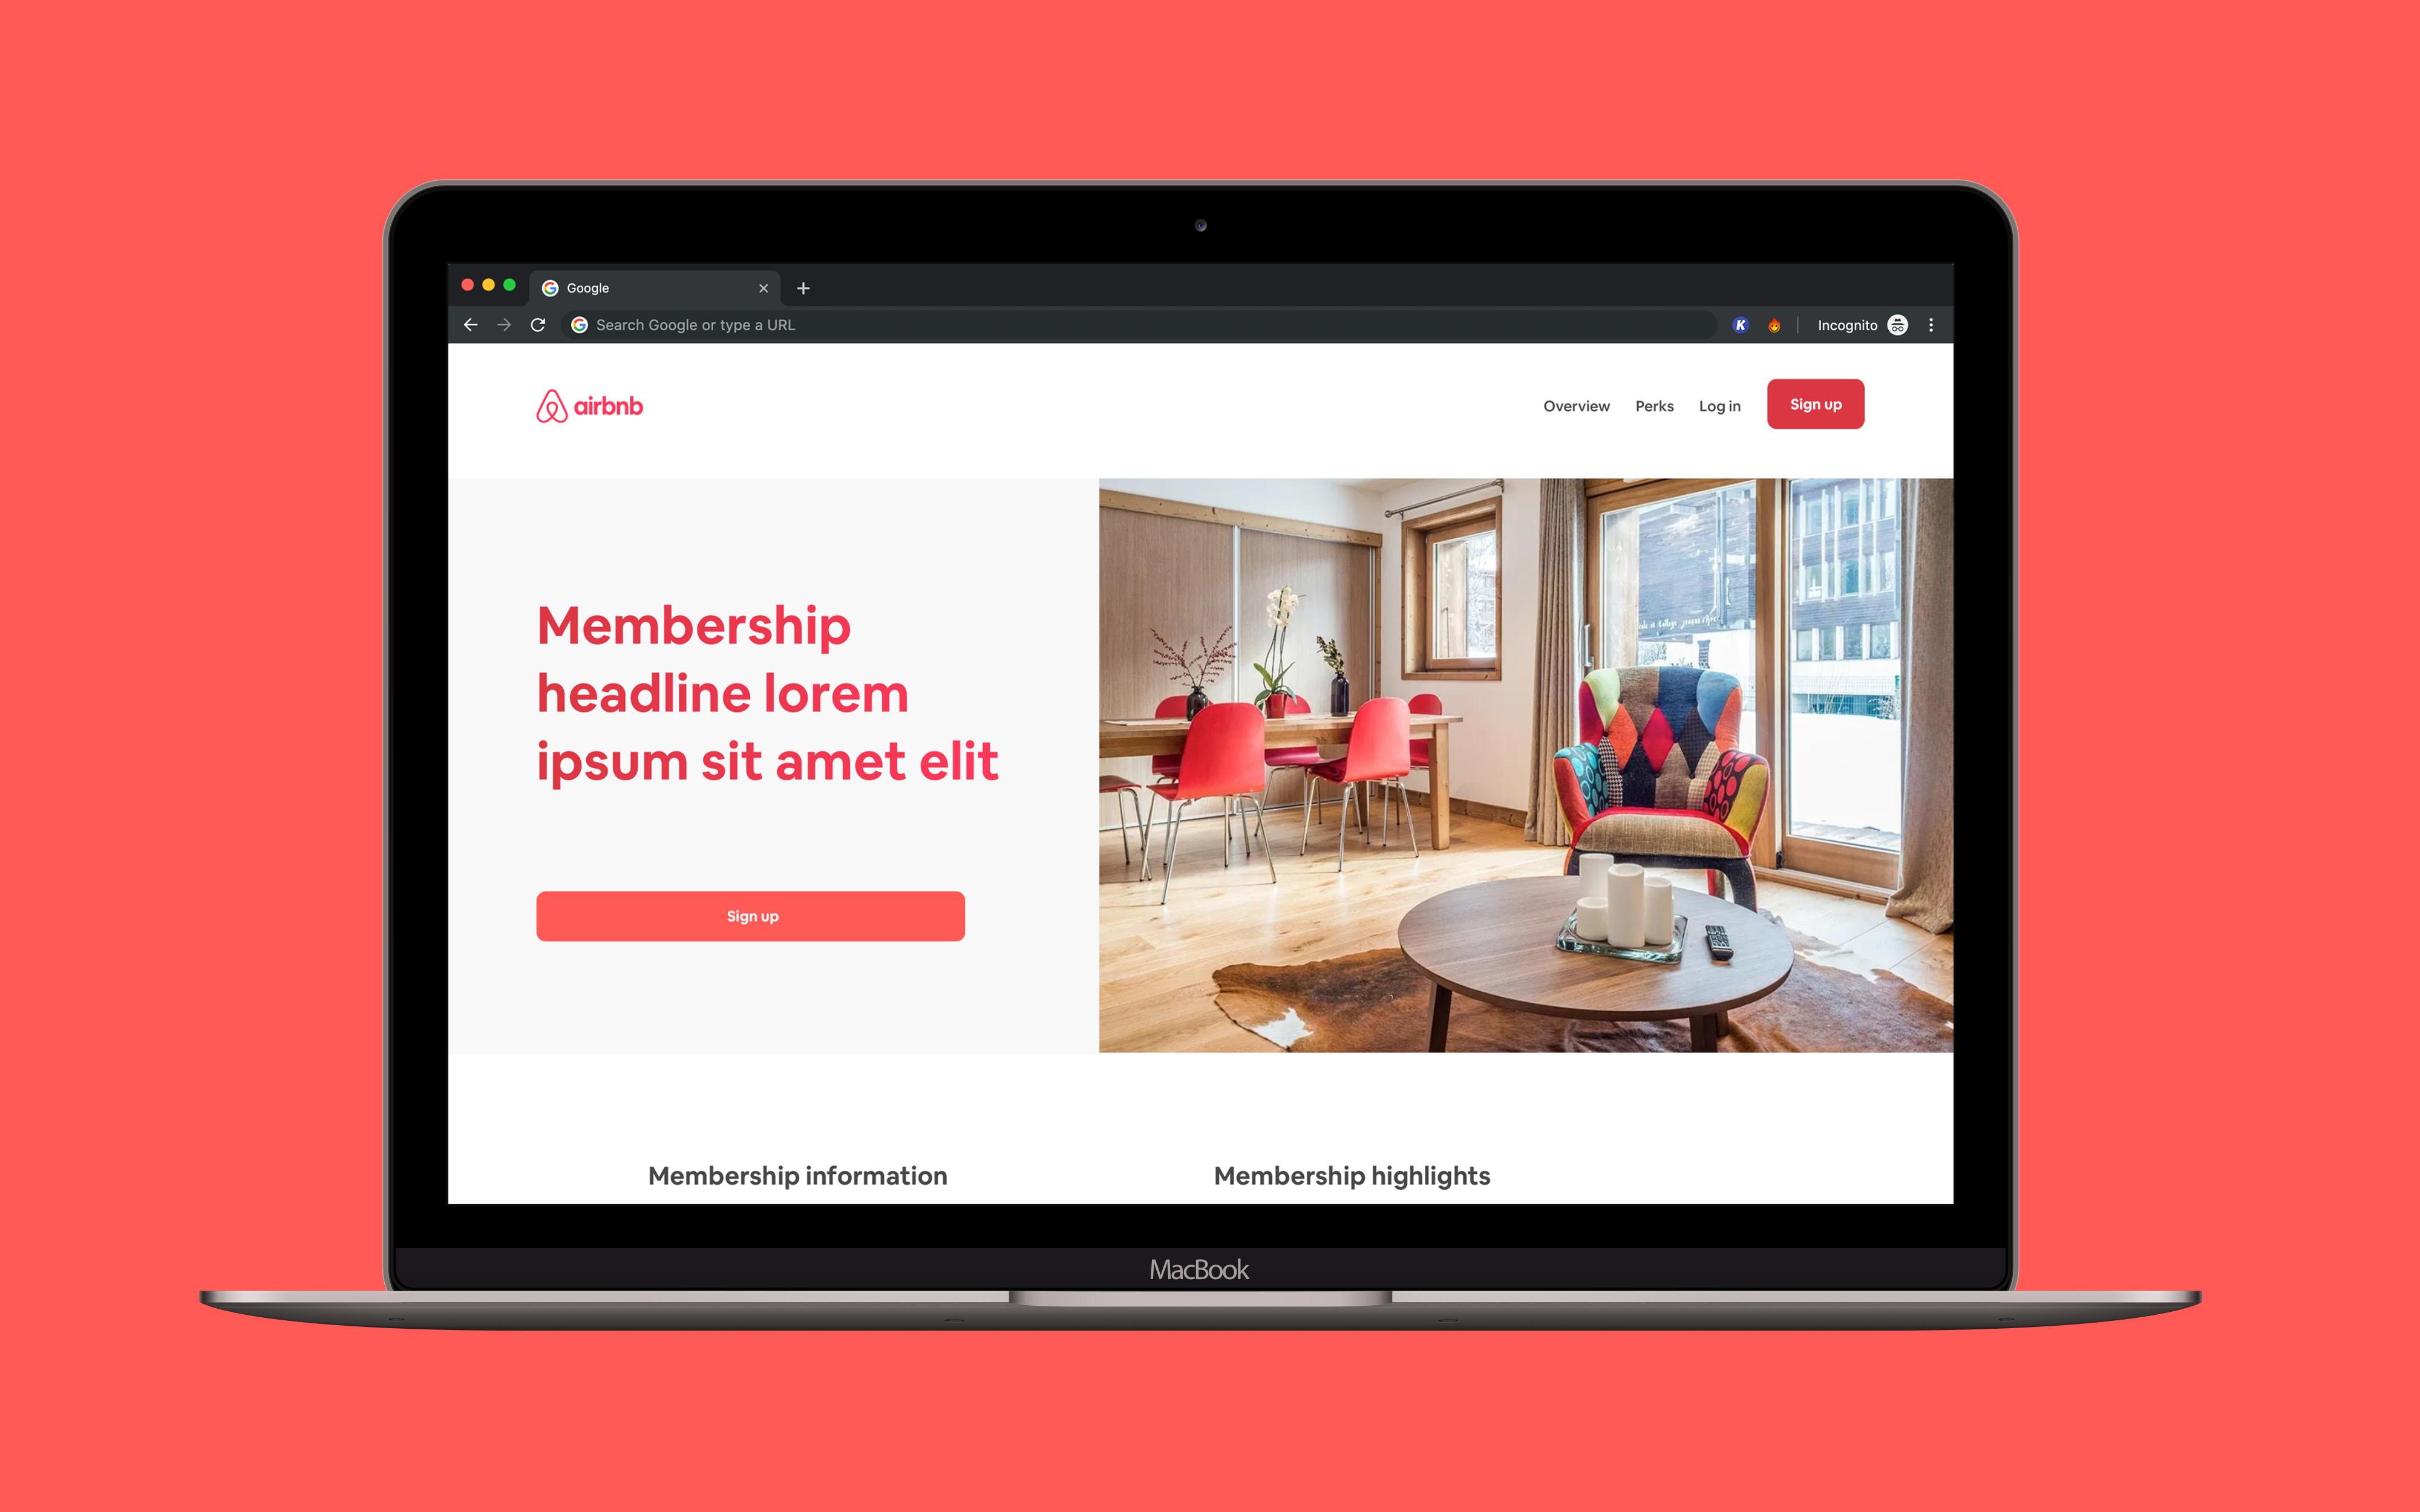 Airbnb membership flow cover image